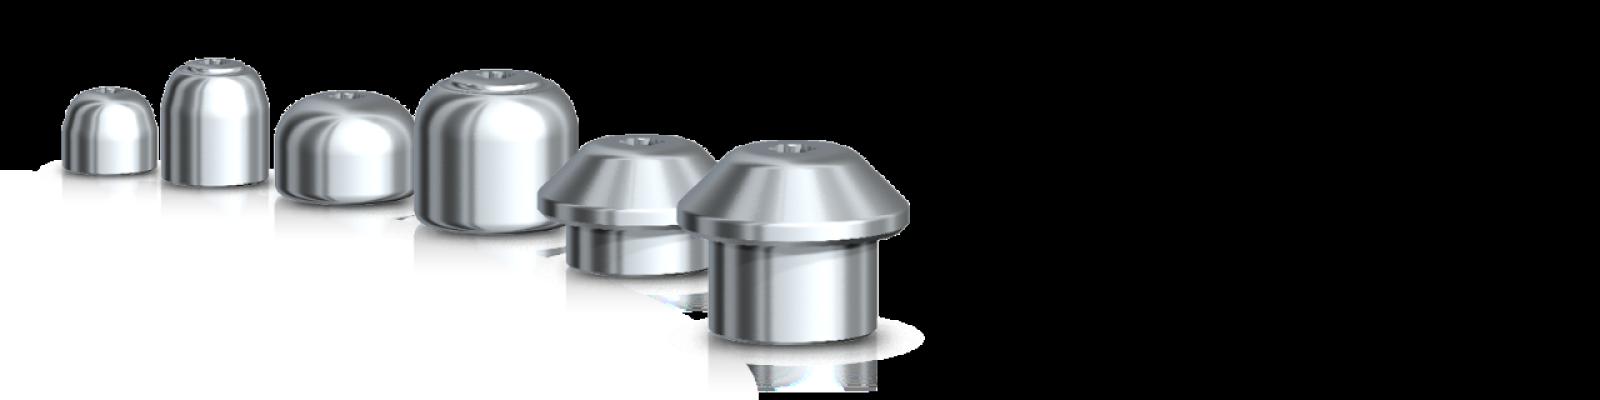 Tapa de cicatrización Multi-Unit de titanio